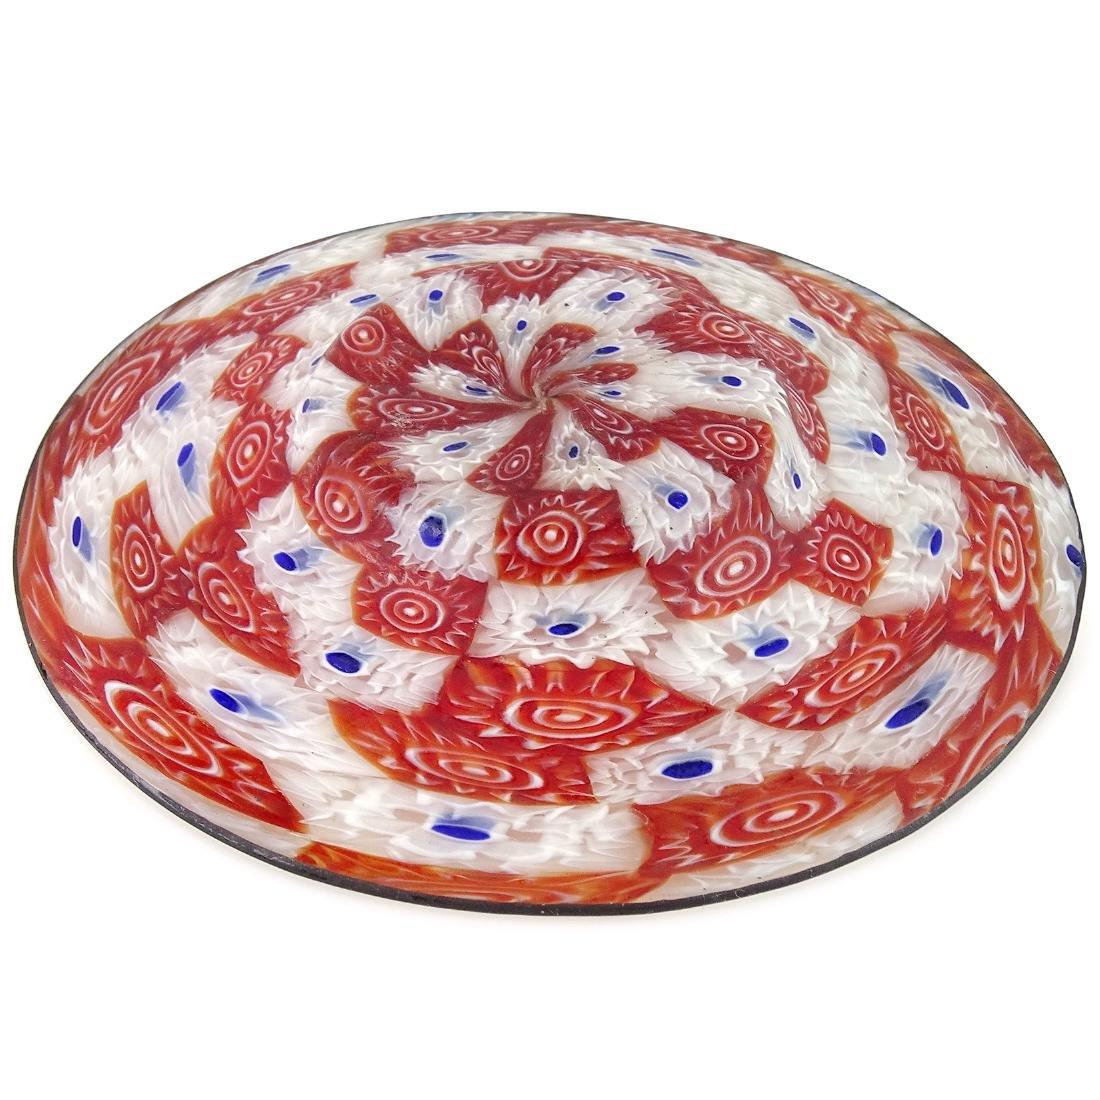 Fratelli Toso Murano Millefiori Italian Art Glass Dish - 3